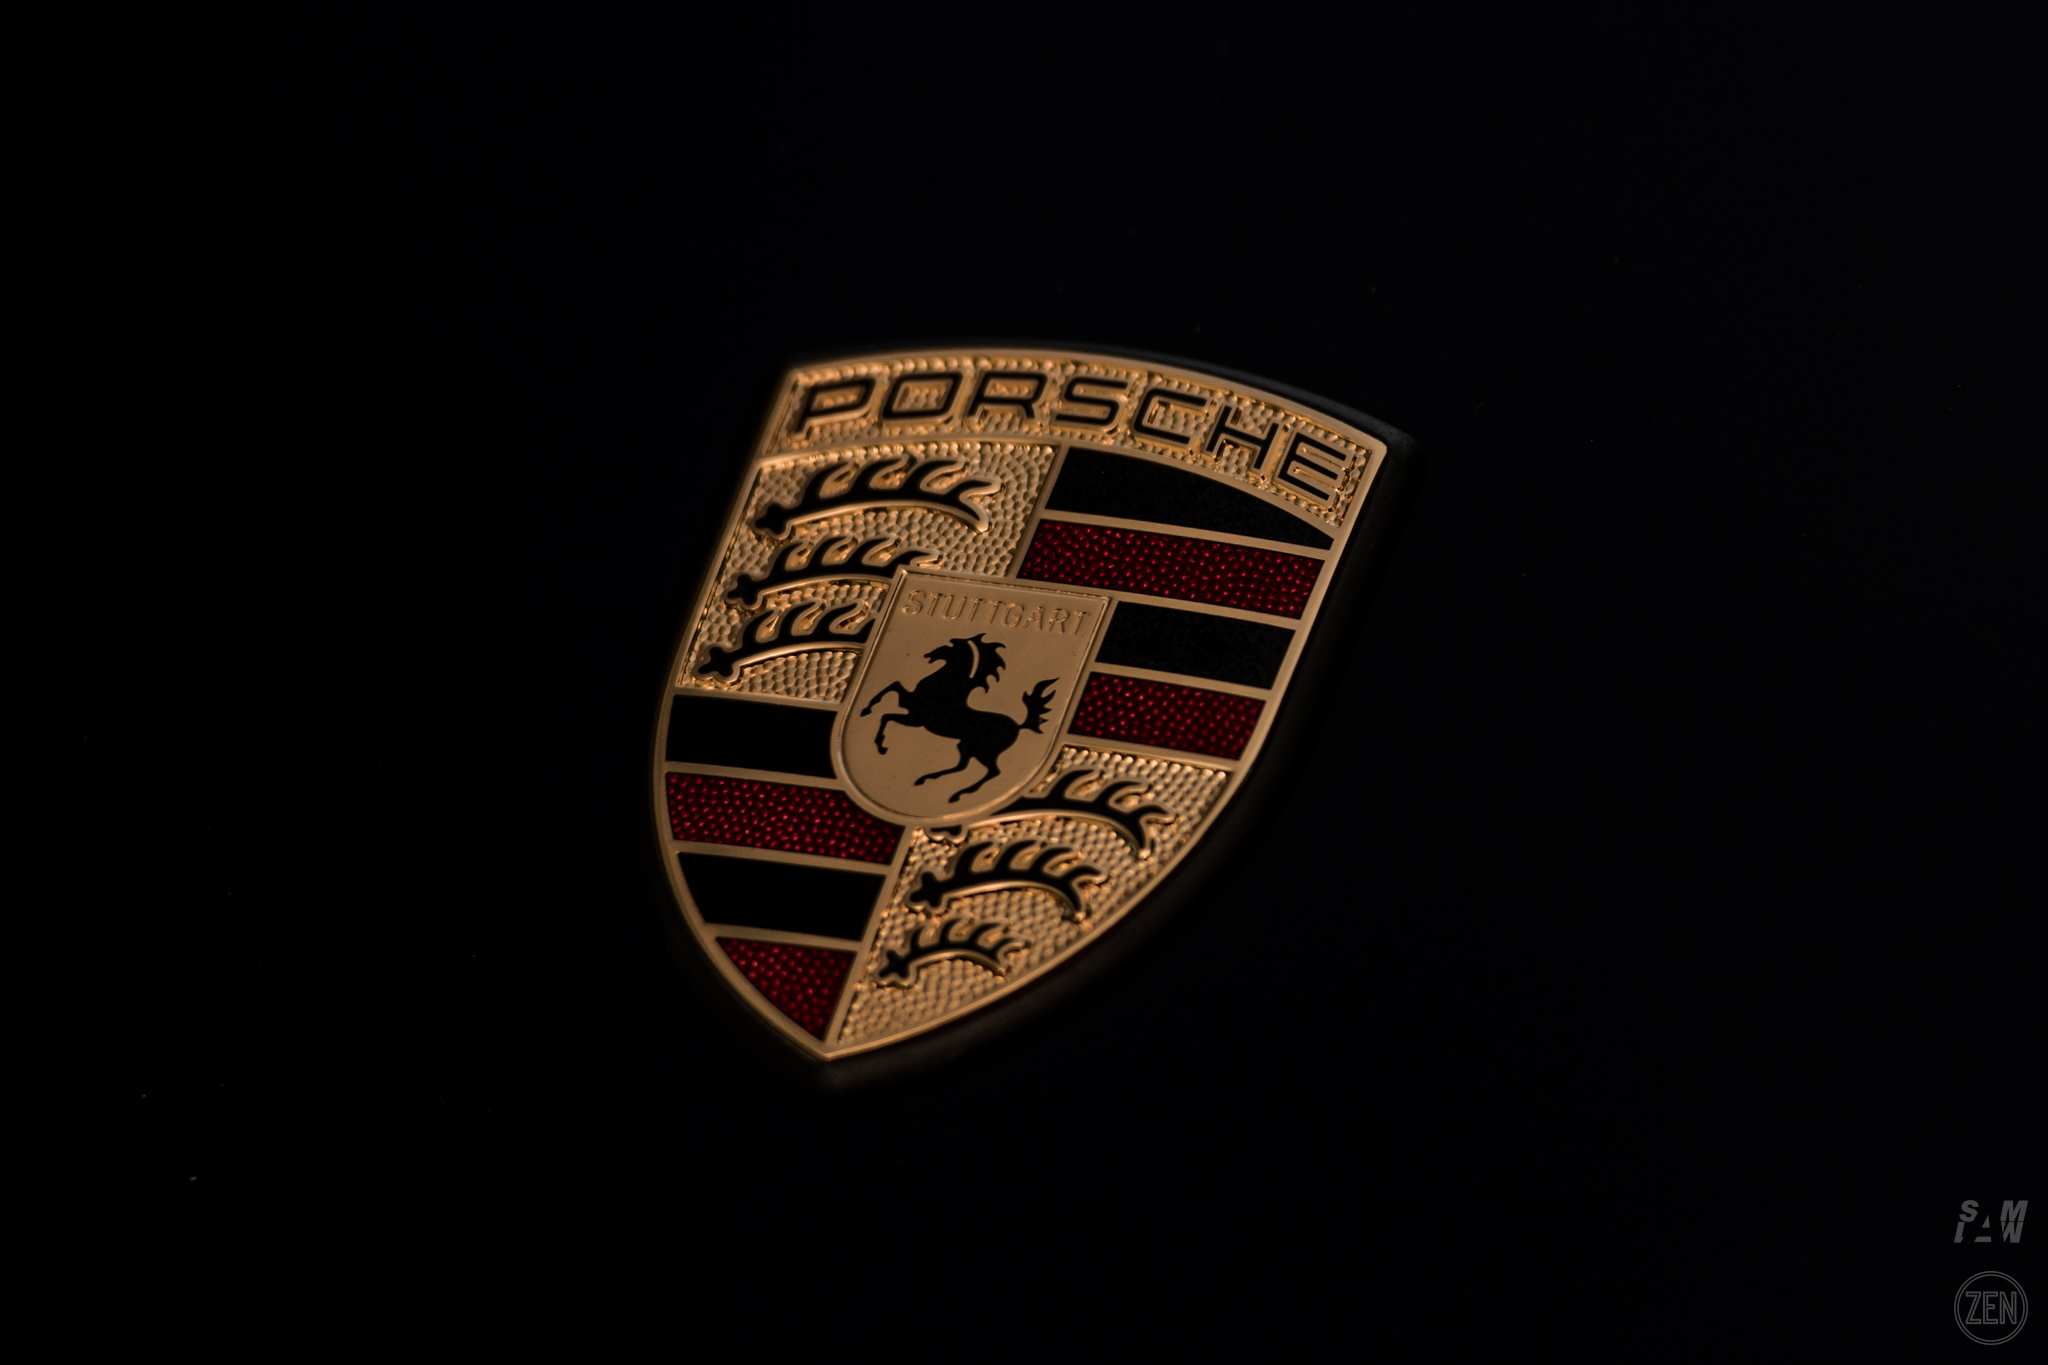 2019-10-27 - Autohaus Porsches & Coffee 117